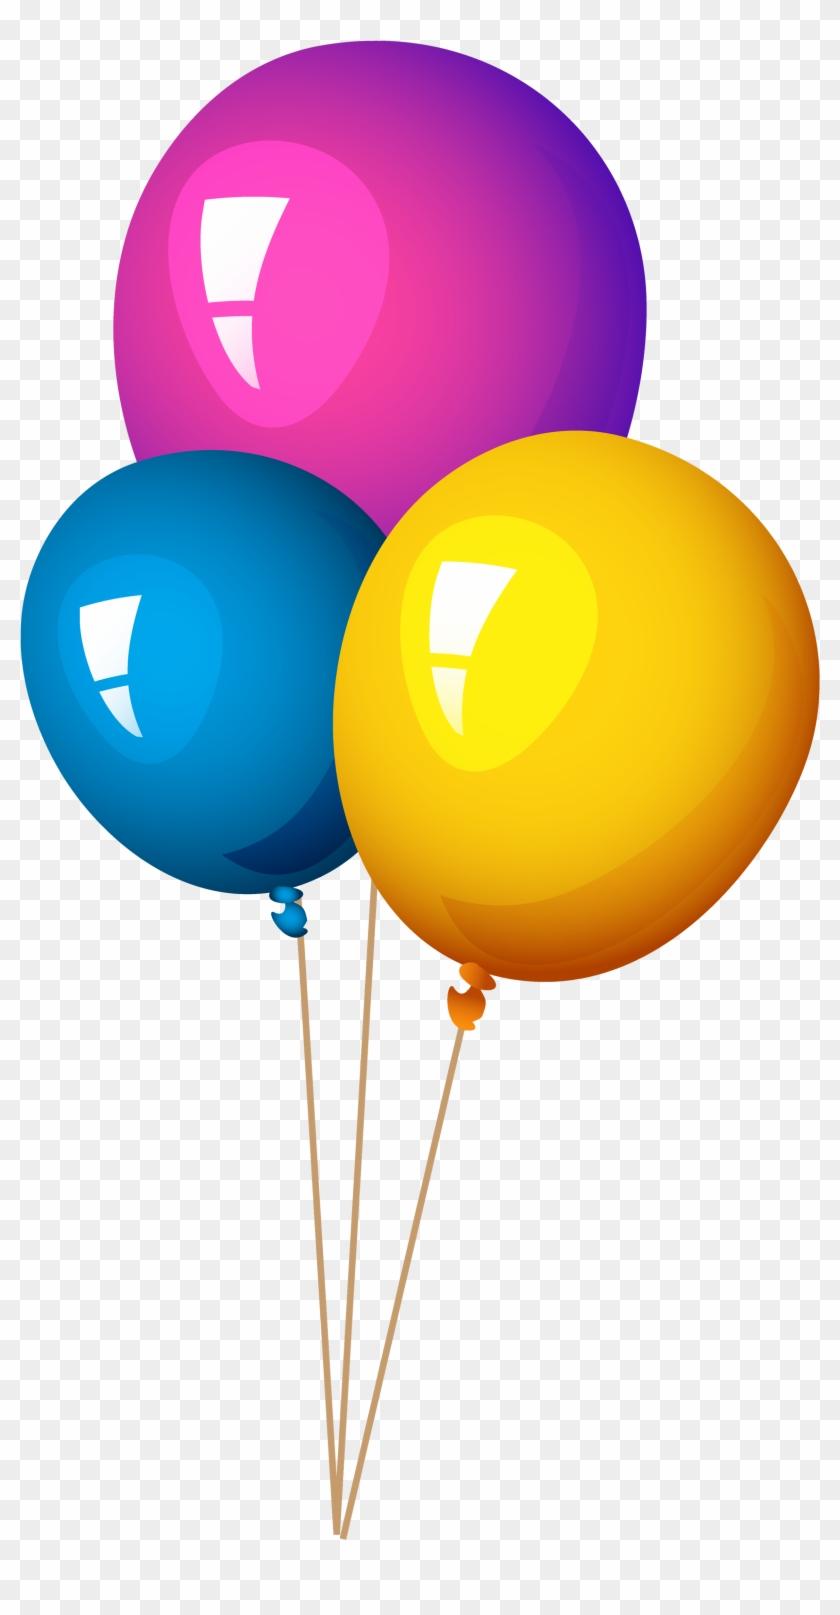 Balloon Png Image Pngpix All Emoji Faces Flower Emoji.